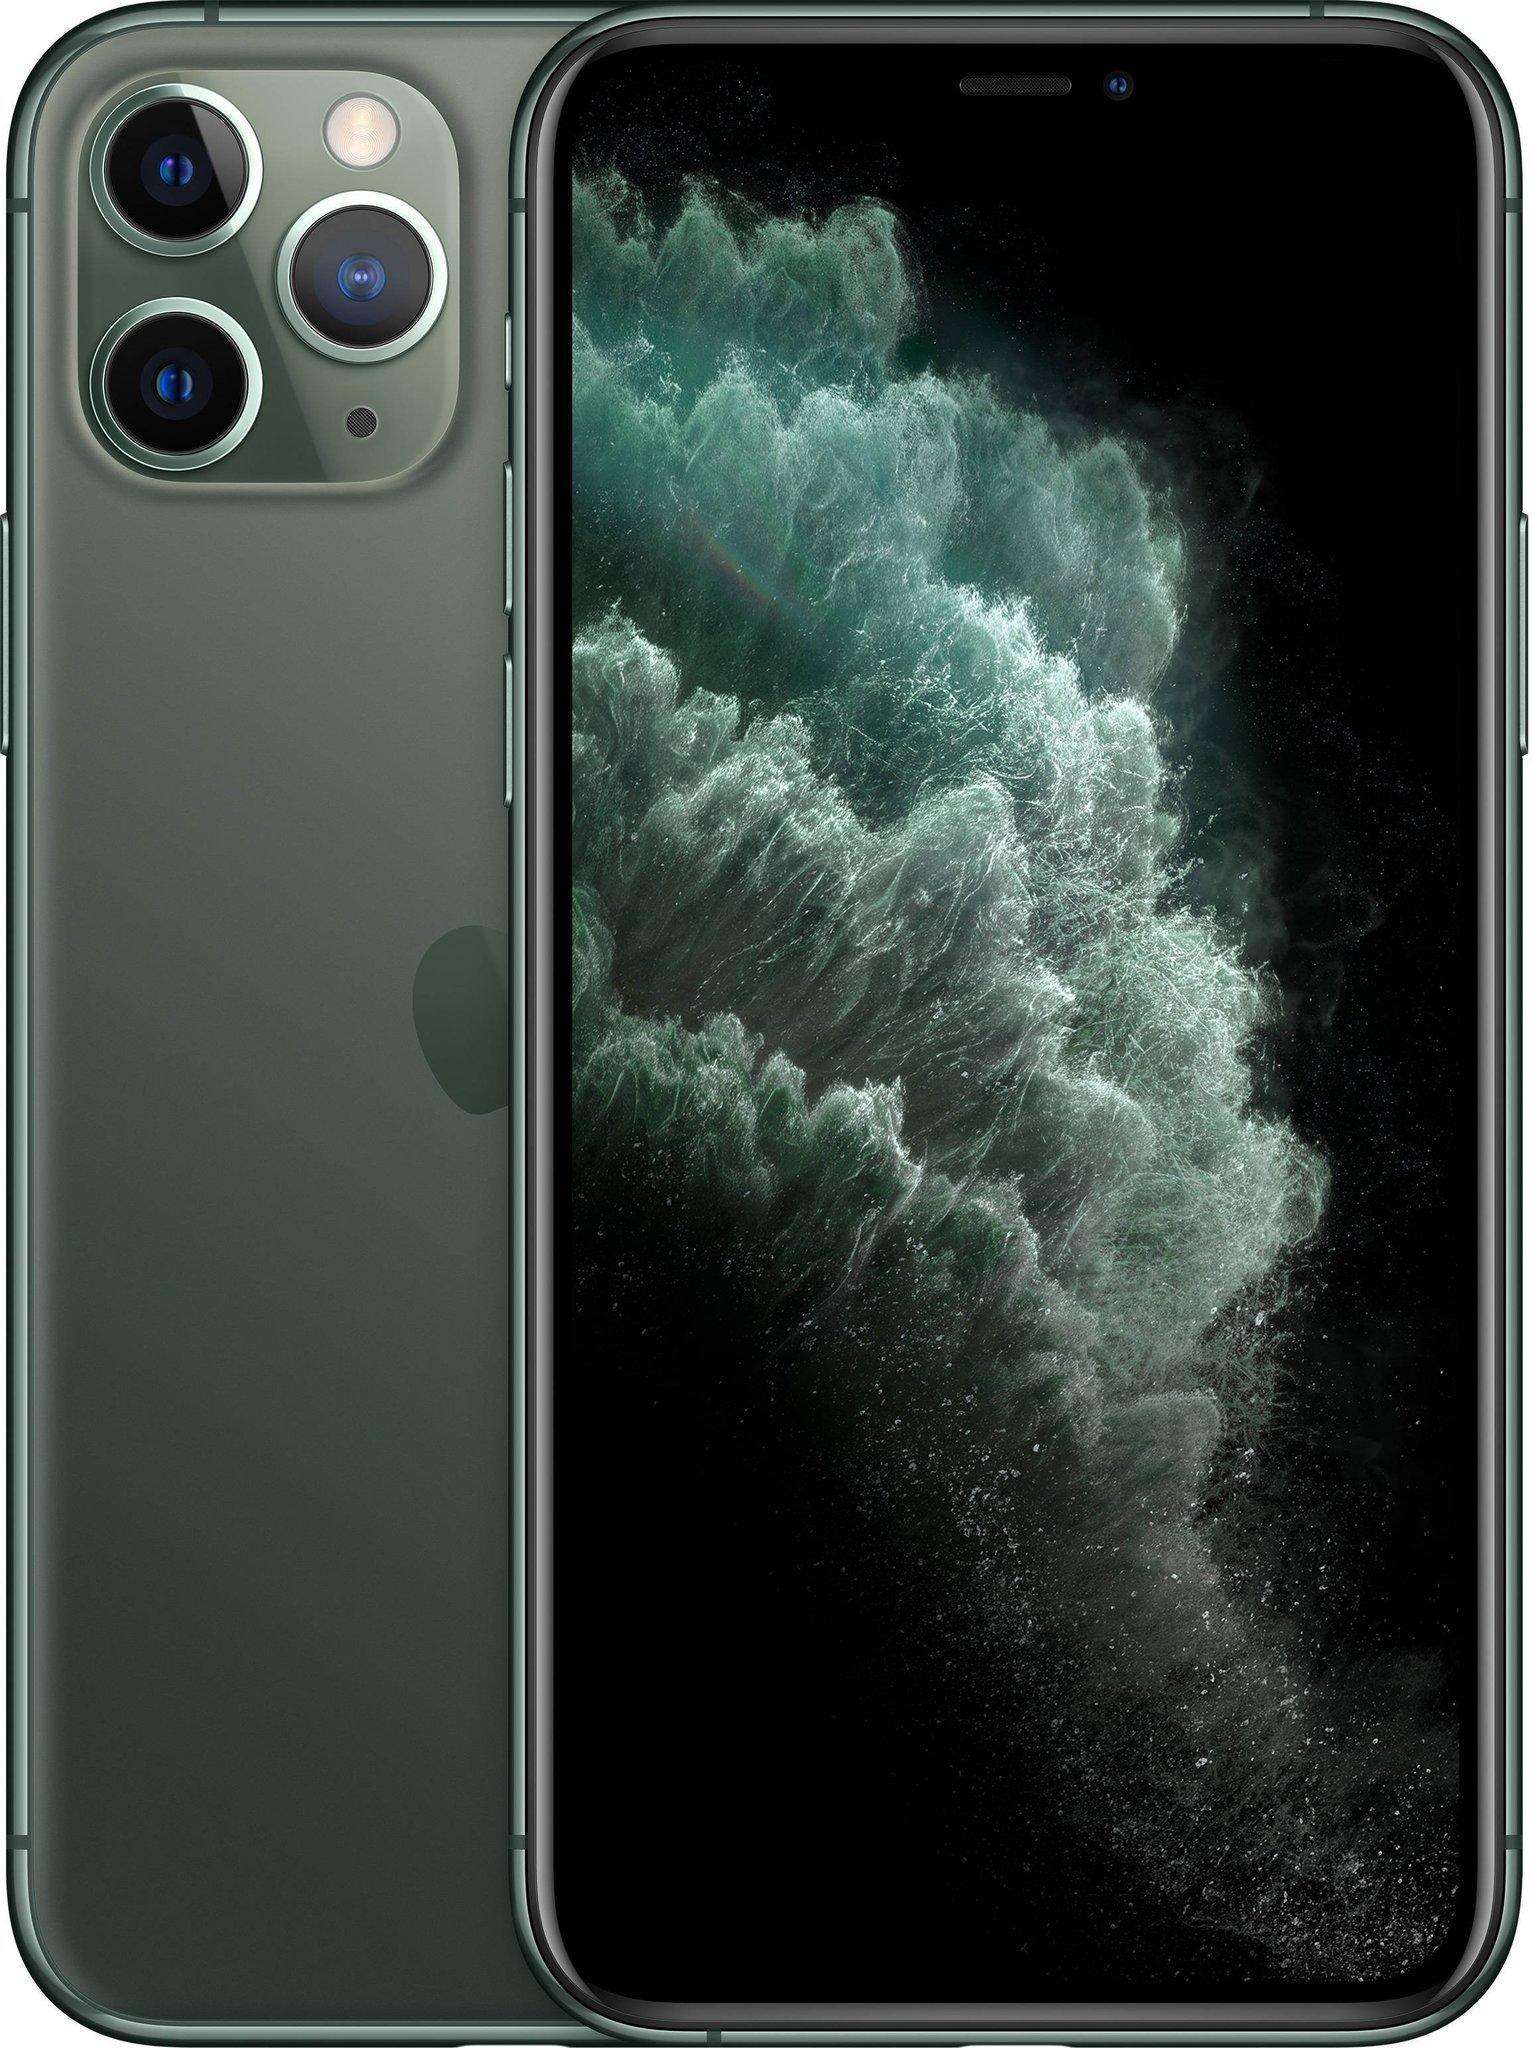 iPhone 11 Pro Apple iPhone 11 Pro 512gb Темно-зеленый green1.jpg